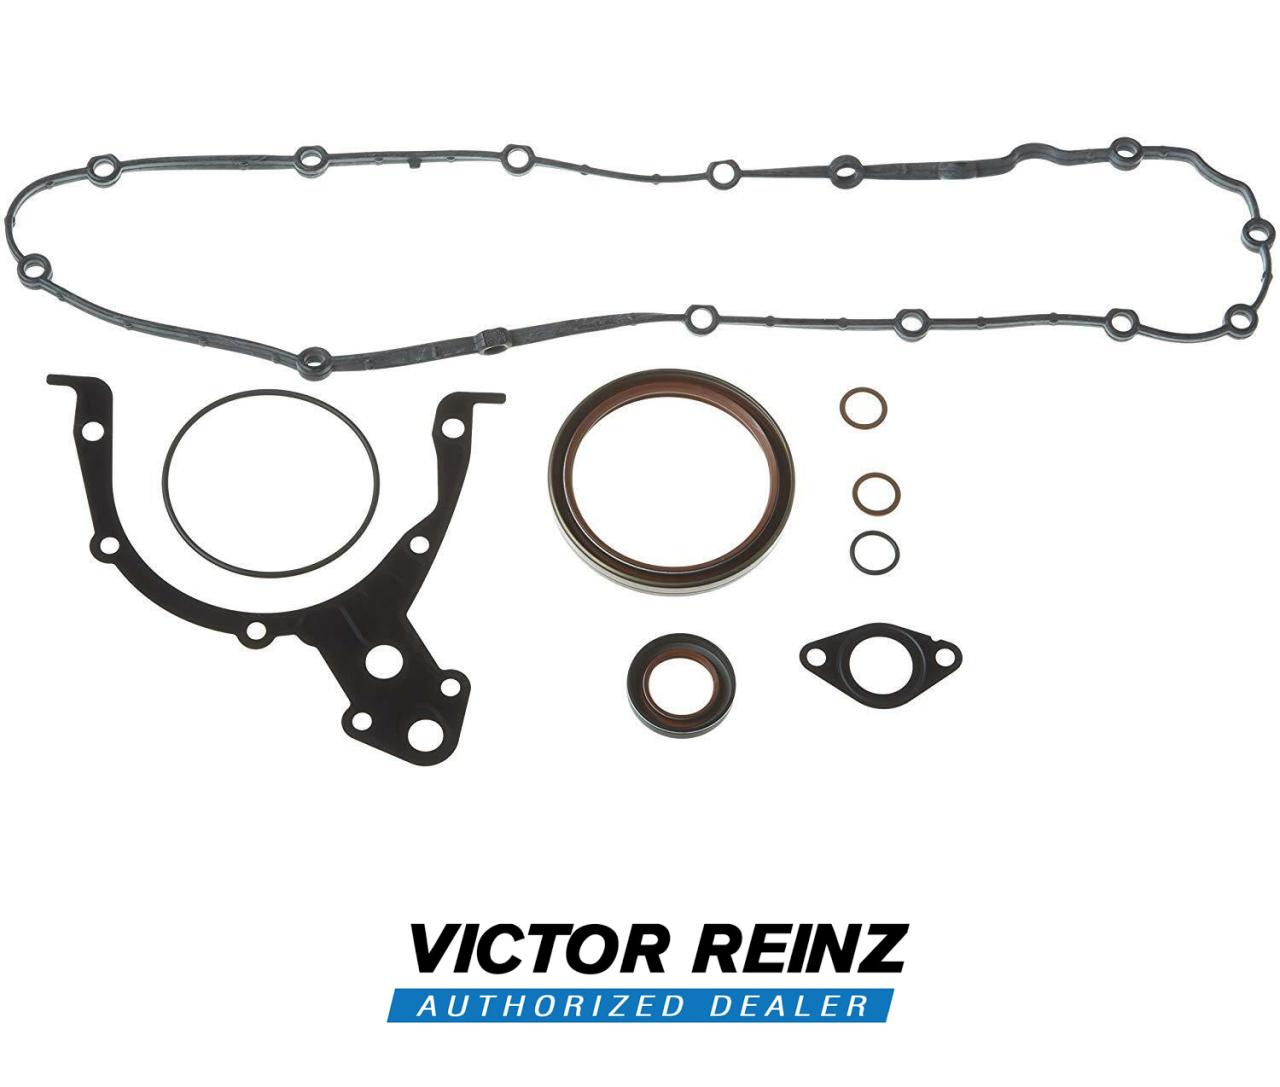 Opel Astra F 1.4 - 1.6 16 Valf Alt Takım Conta Victor Reinz